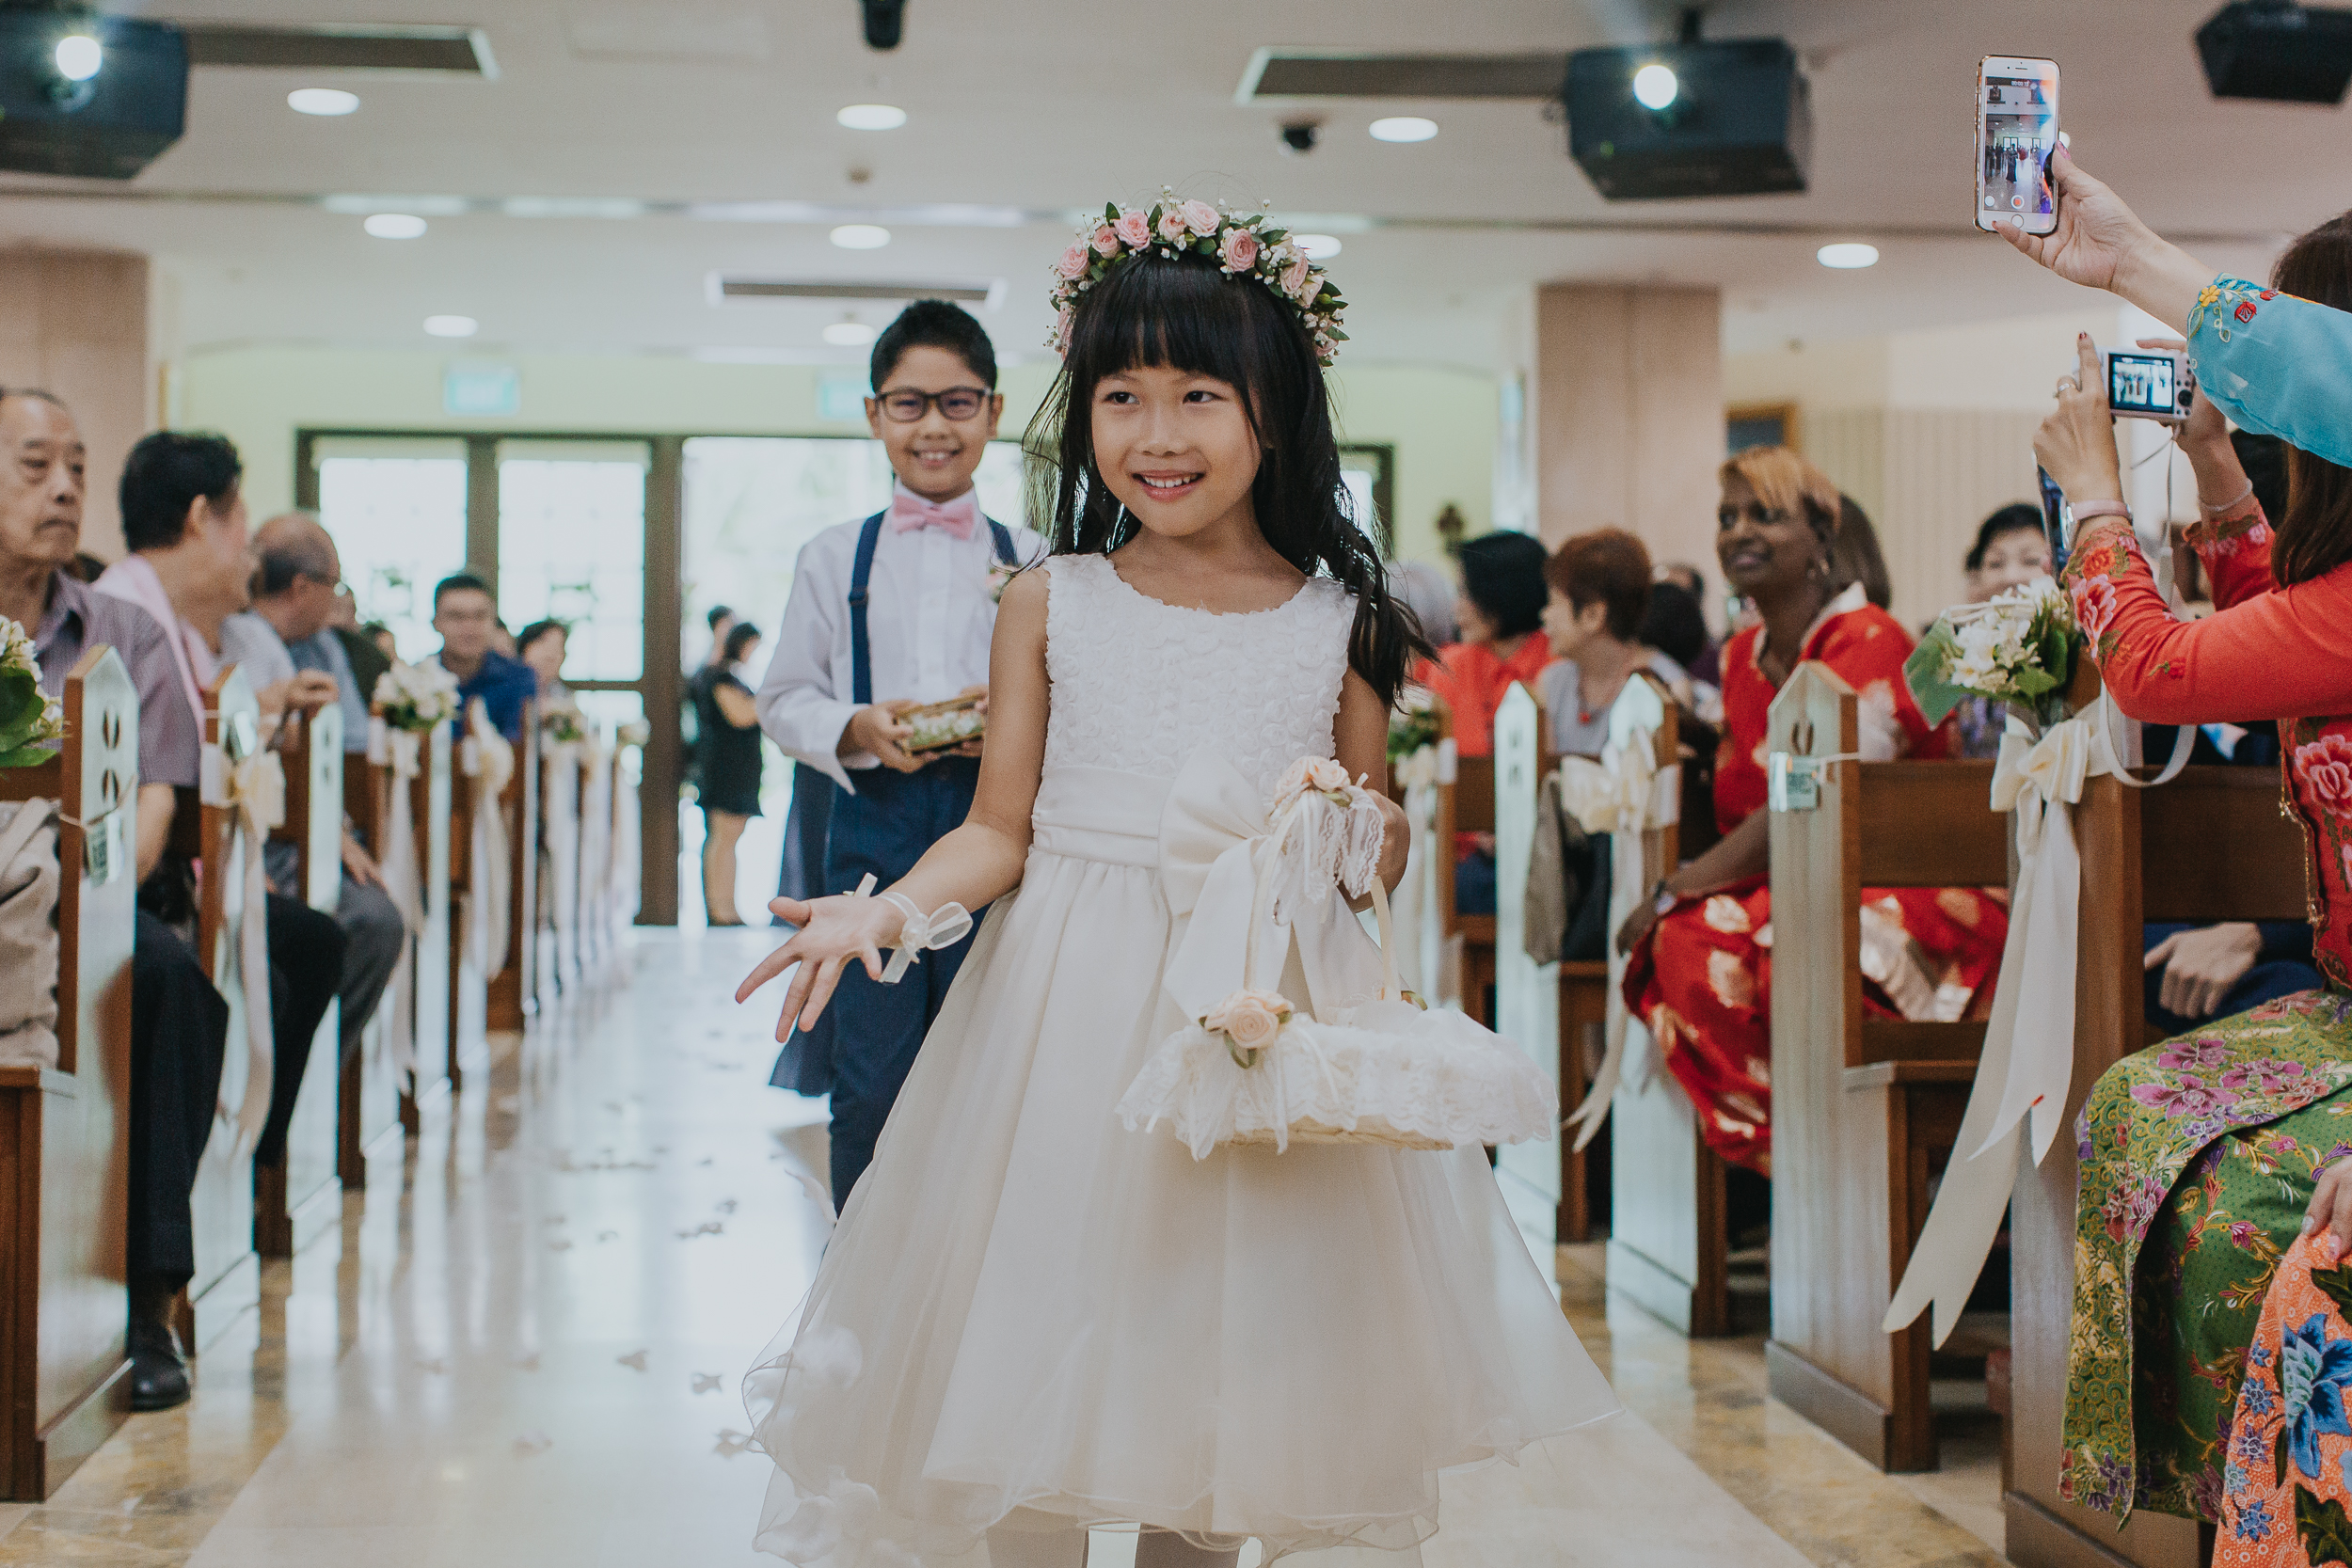 Singapore+Actual+Day+Wedding+Photographer+Grand+Mercure+Oliver+Estelle-0045.jpg